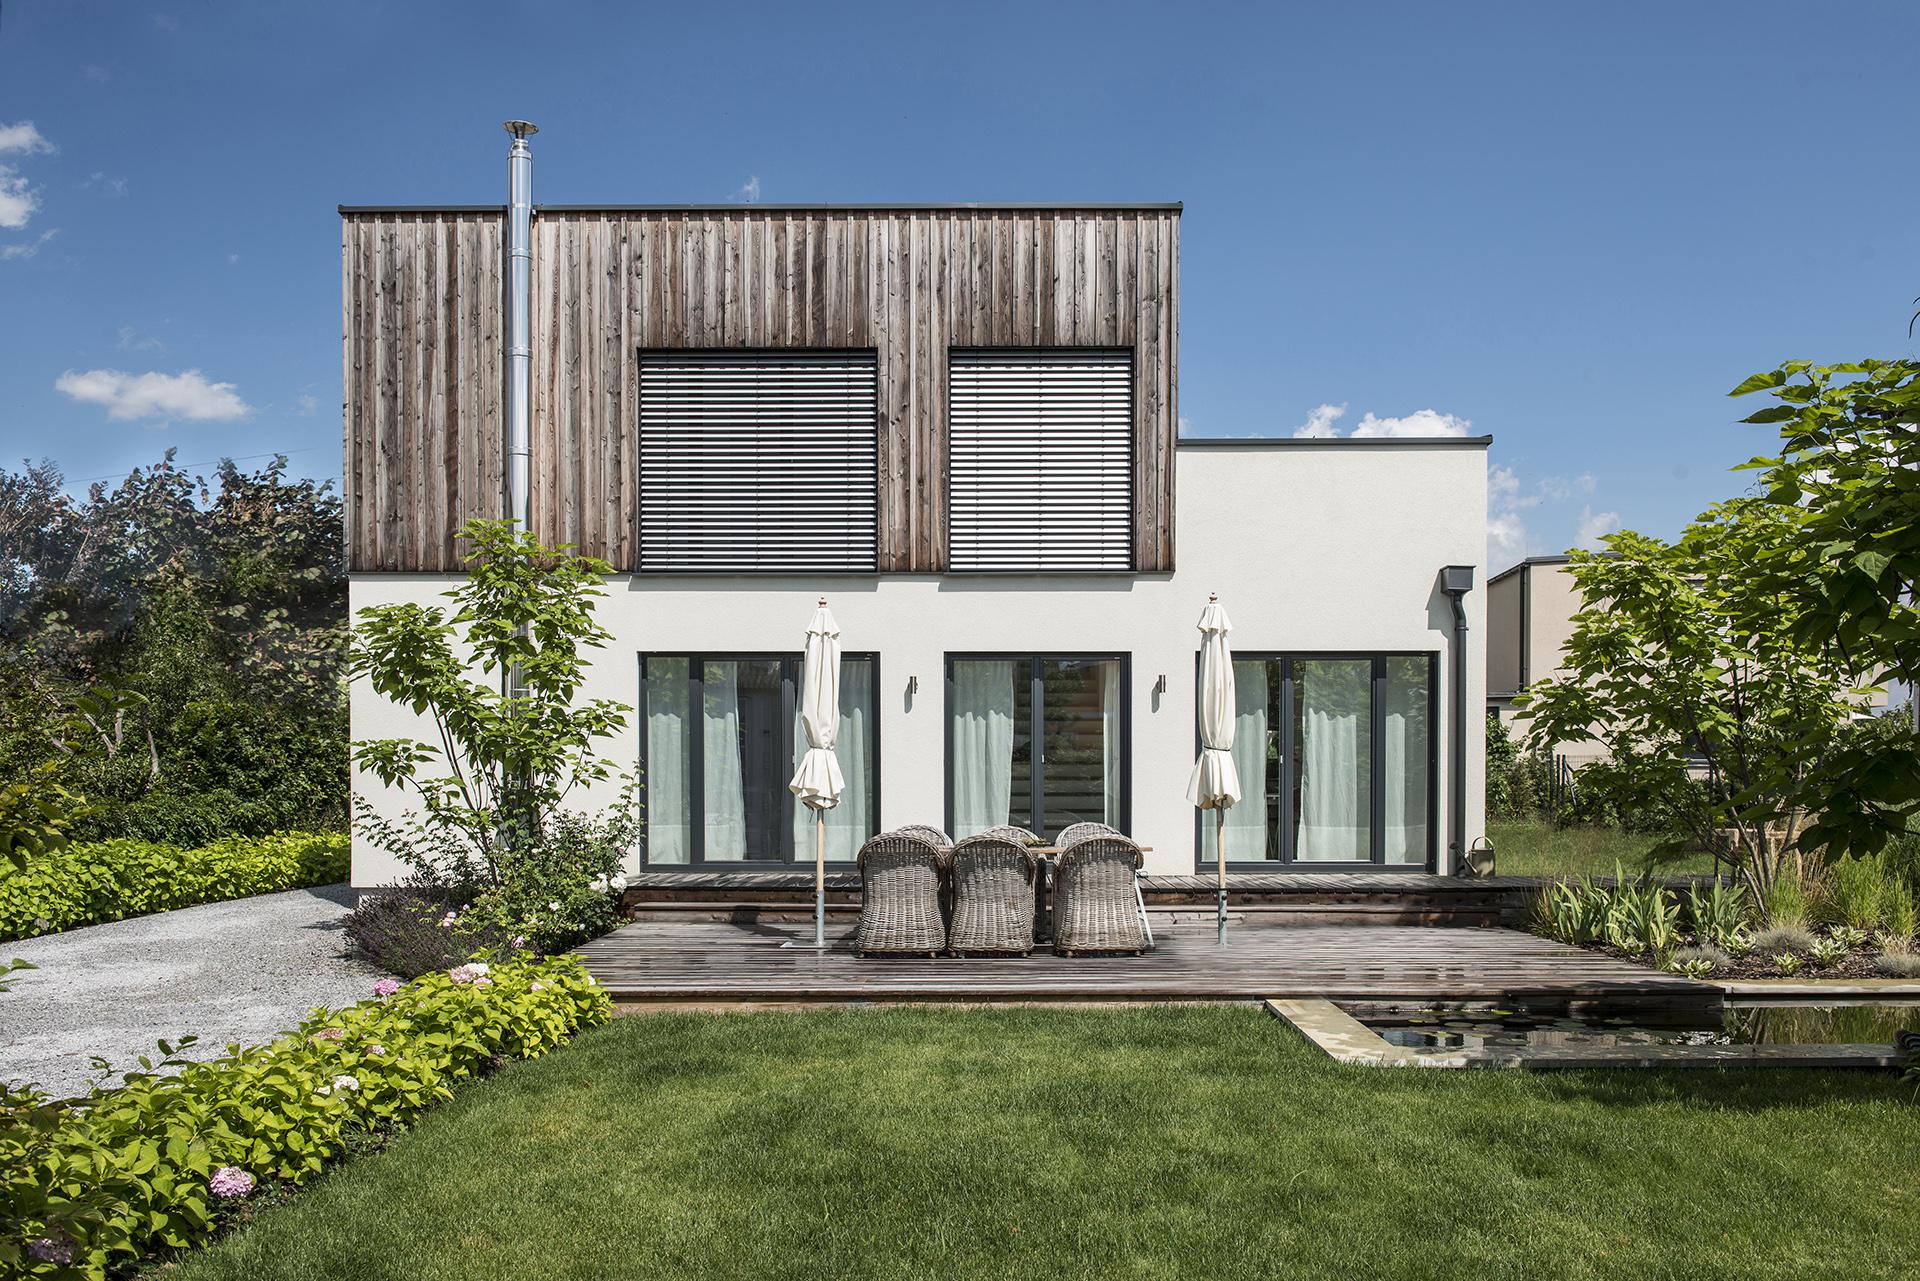 drevodom-drevostavba-zahrada-architektura-terasa-trend-slnecnik